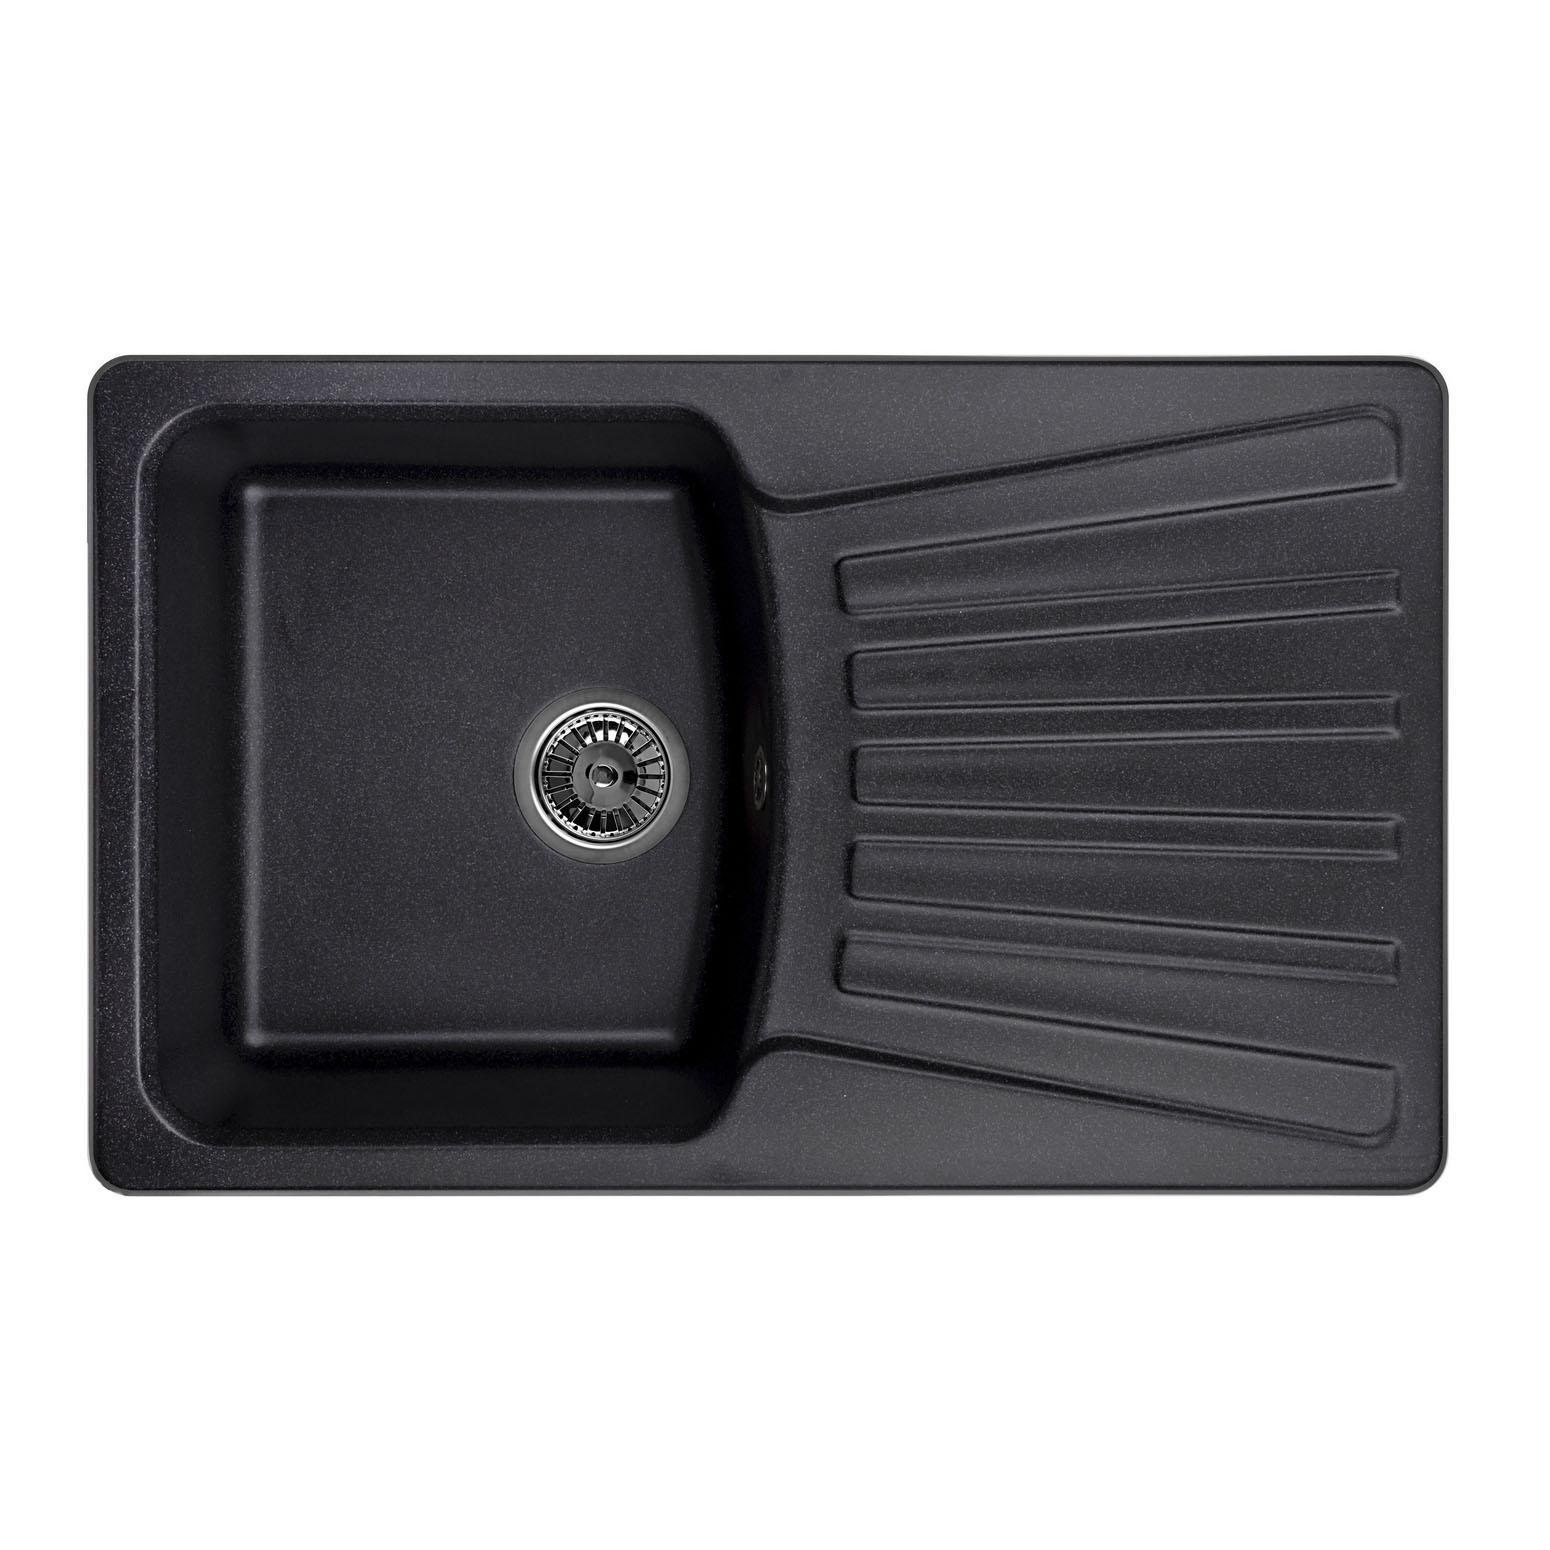 Кухонная мойка Granula GR-8001 790х500 черный посуда кухонная